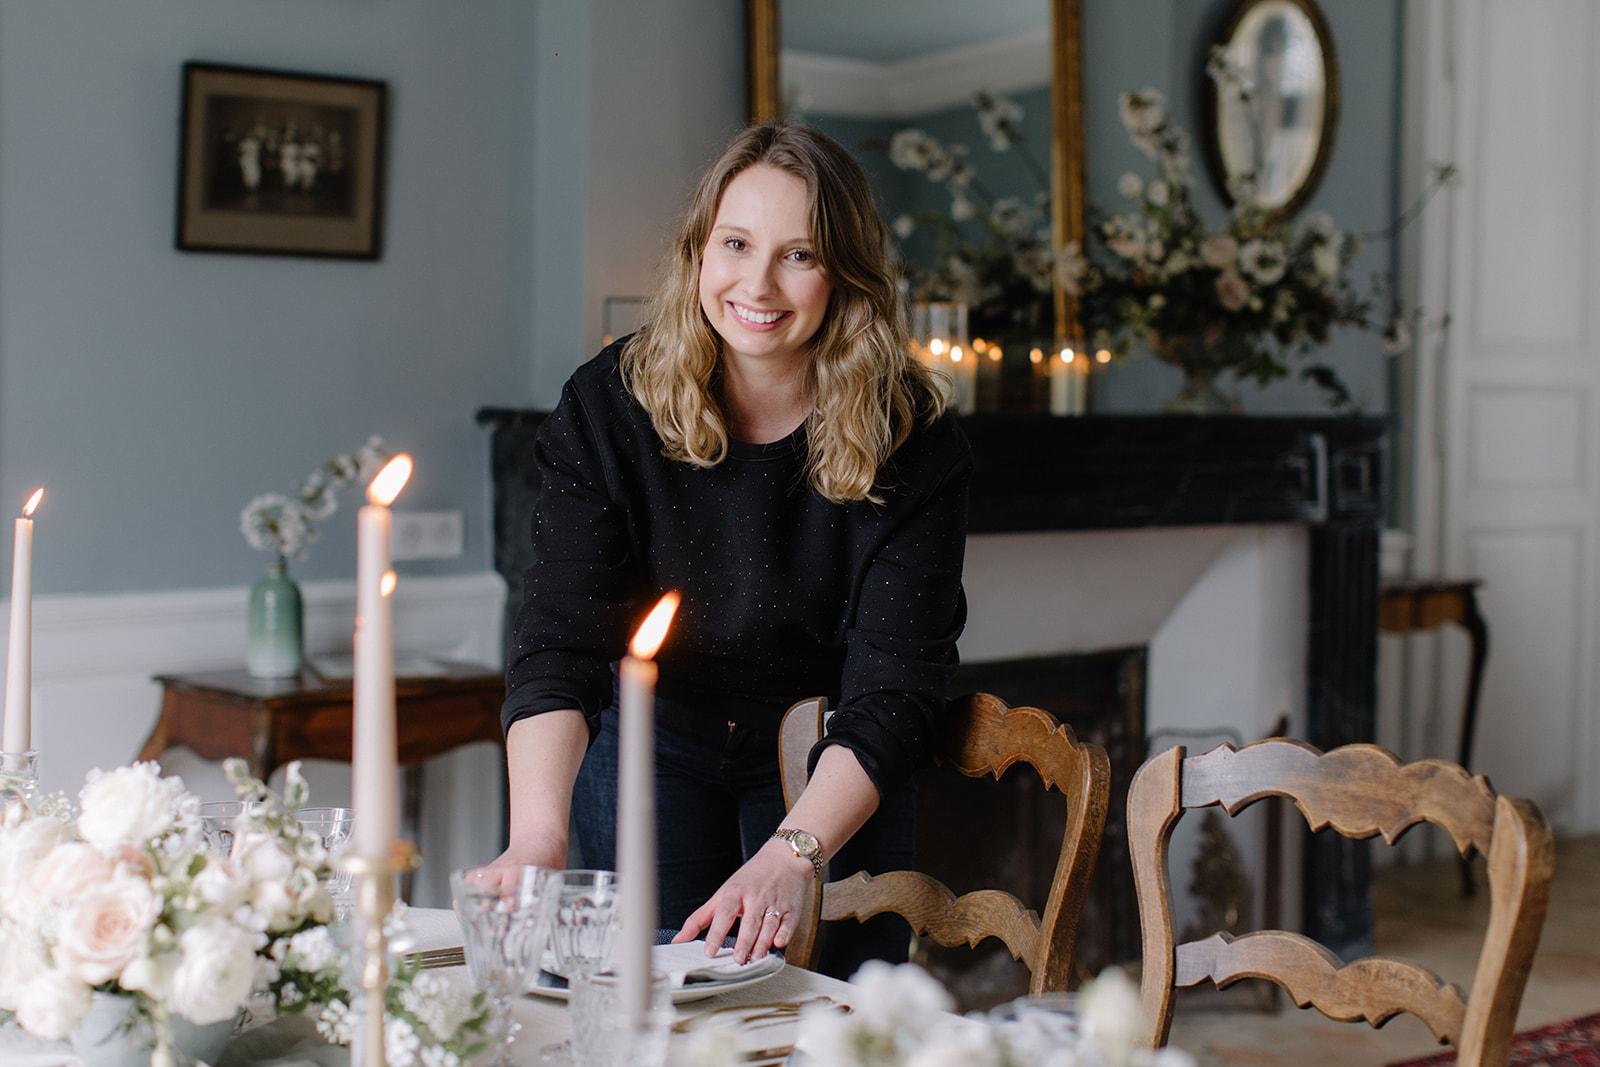 Mirabella Weddings - luxury wedding planner. UK & Destination wedding planner based near London